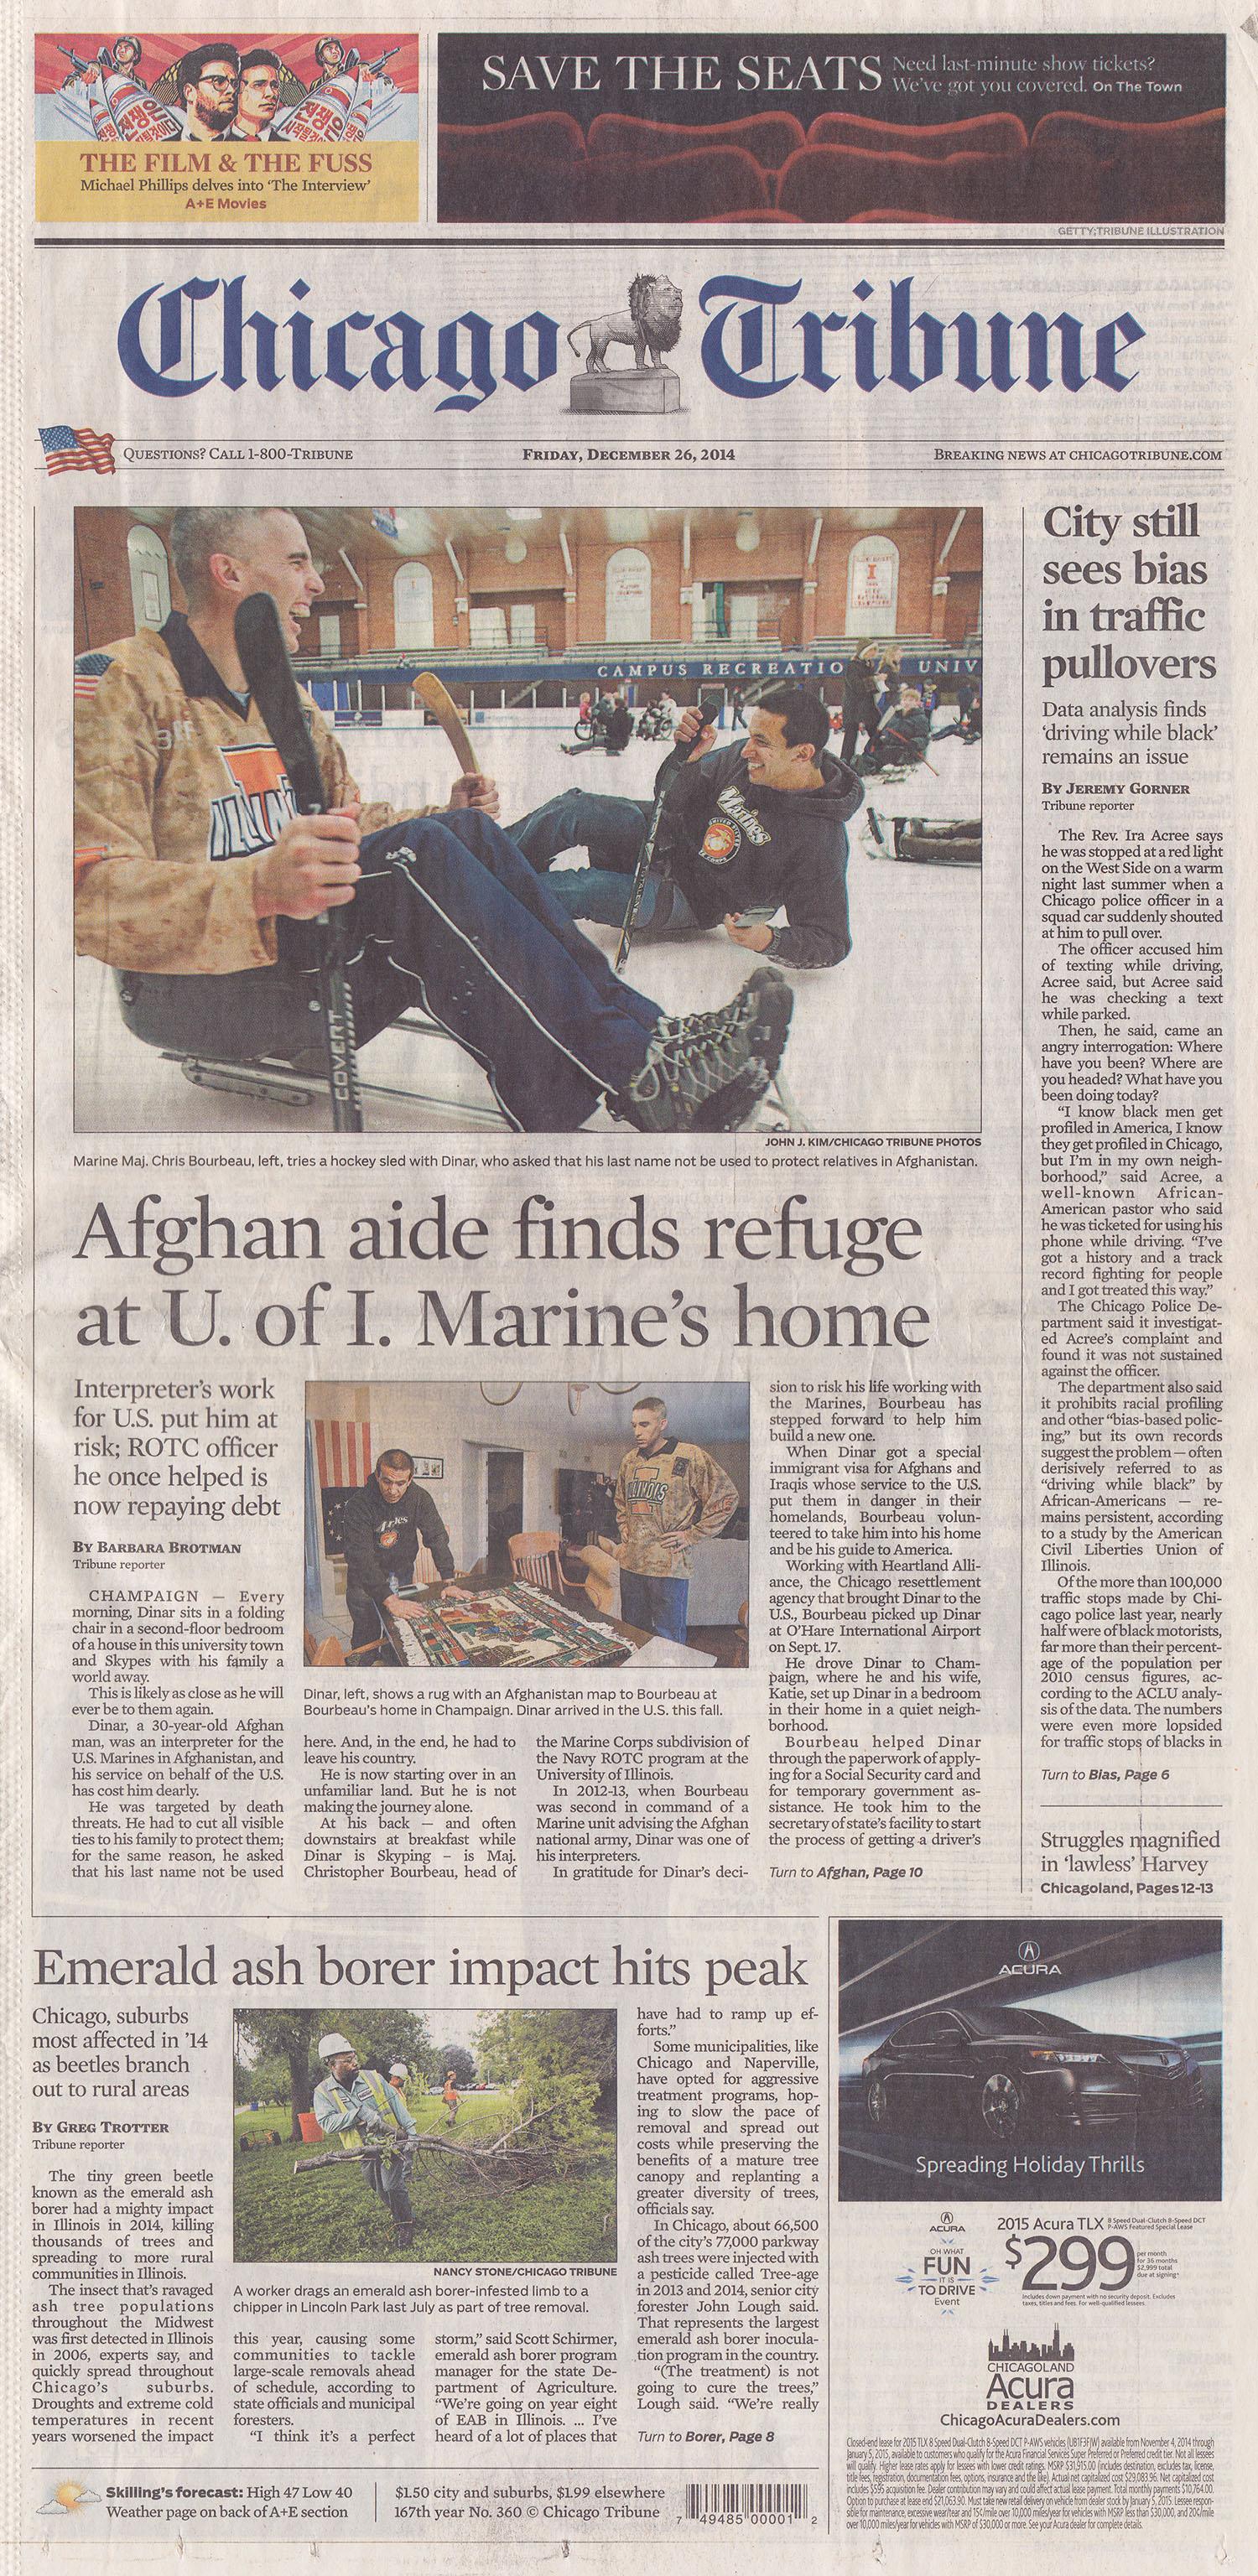 chicago_tribune1b.jpg